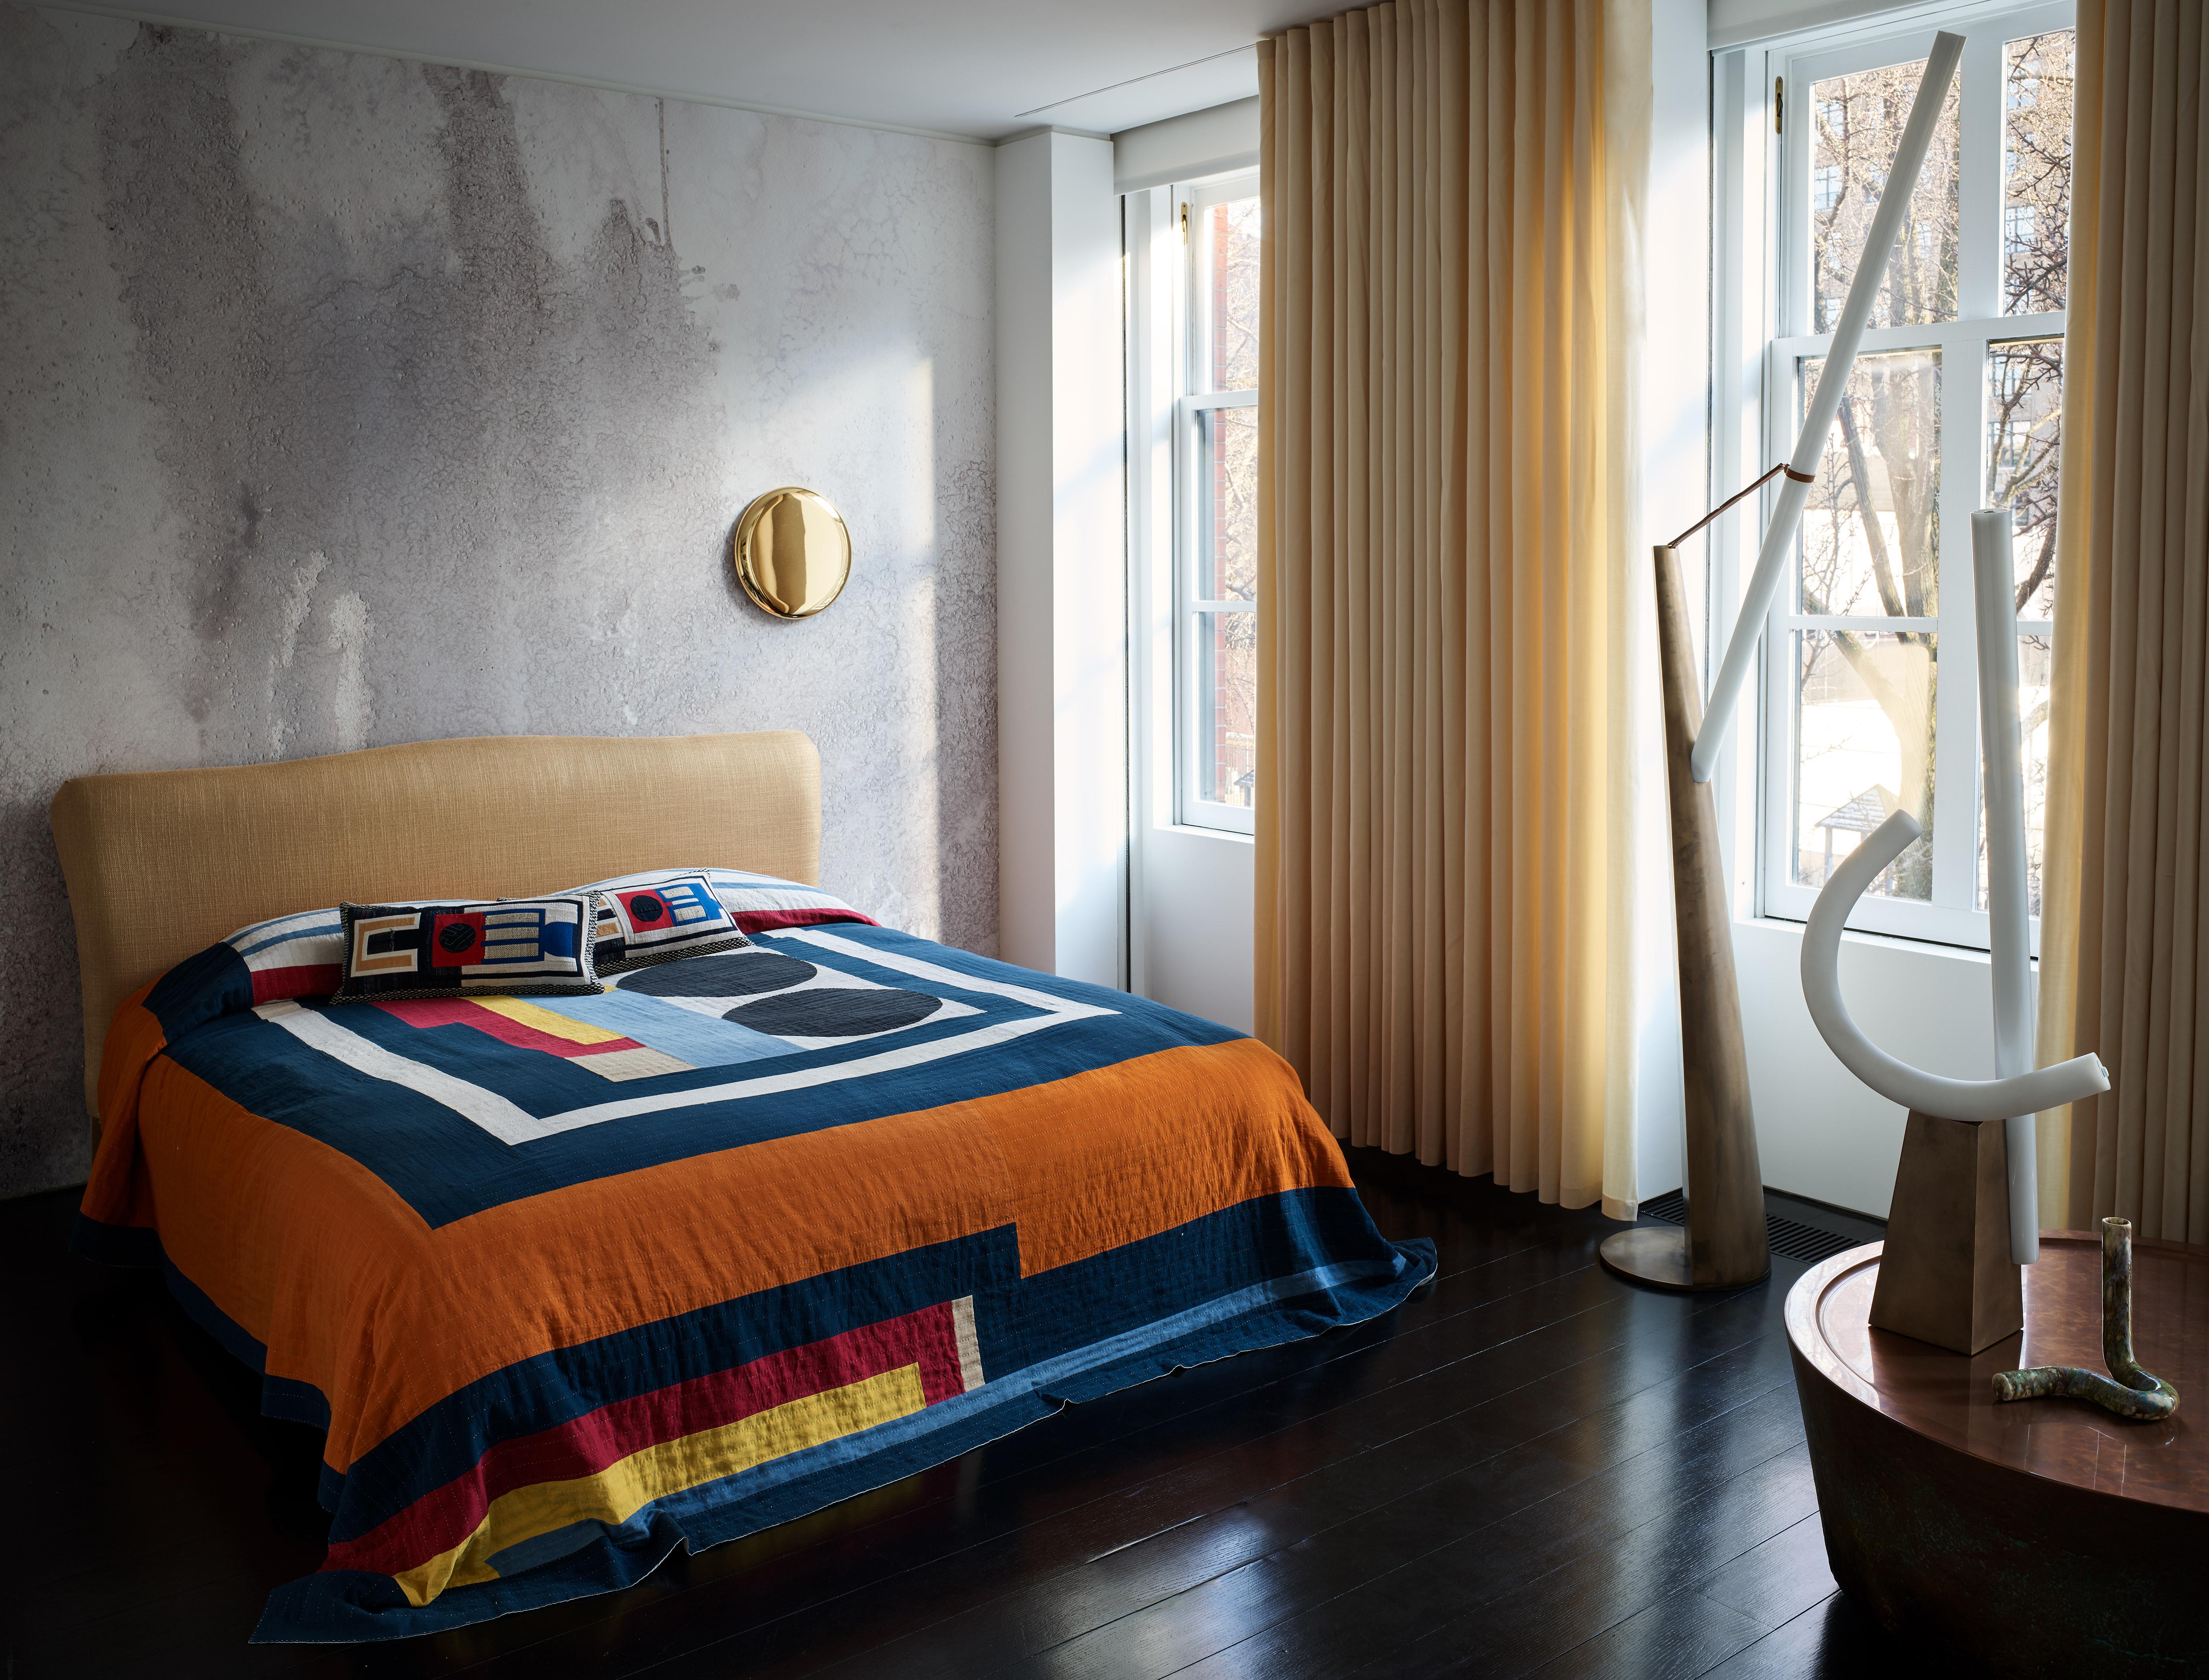 The bedroom in Casa Perfect New York. Image: Douglas Friedman